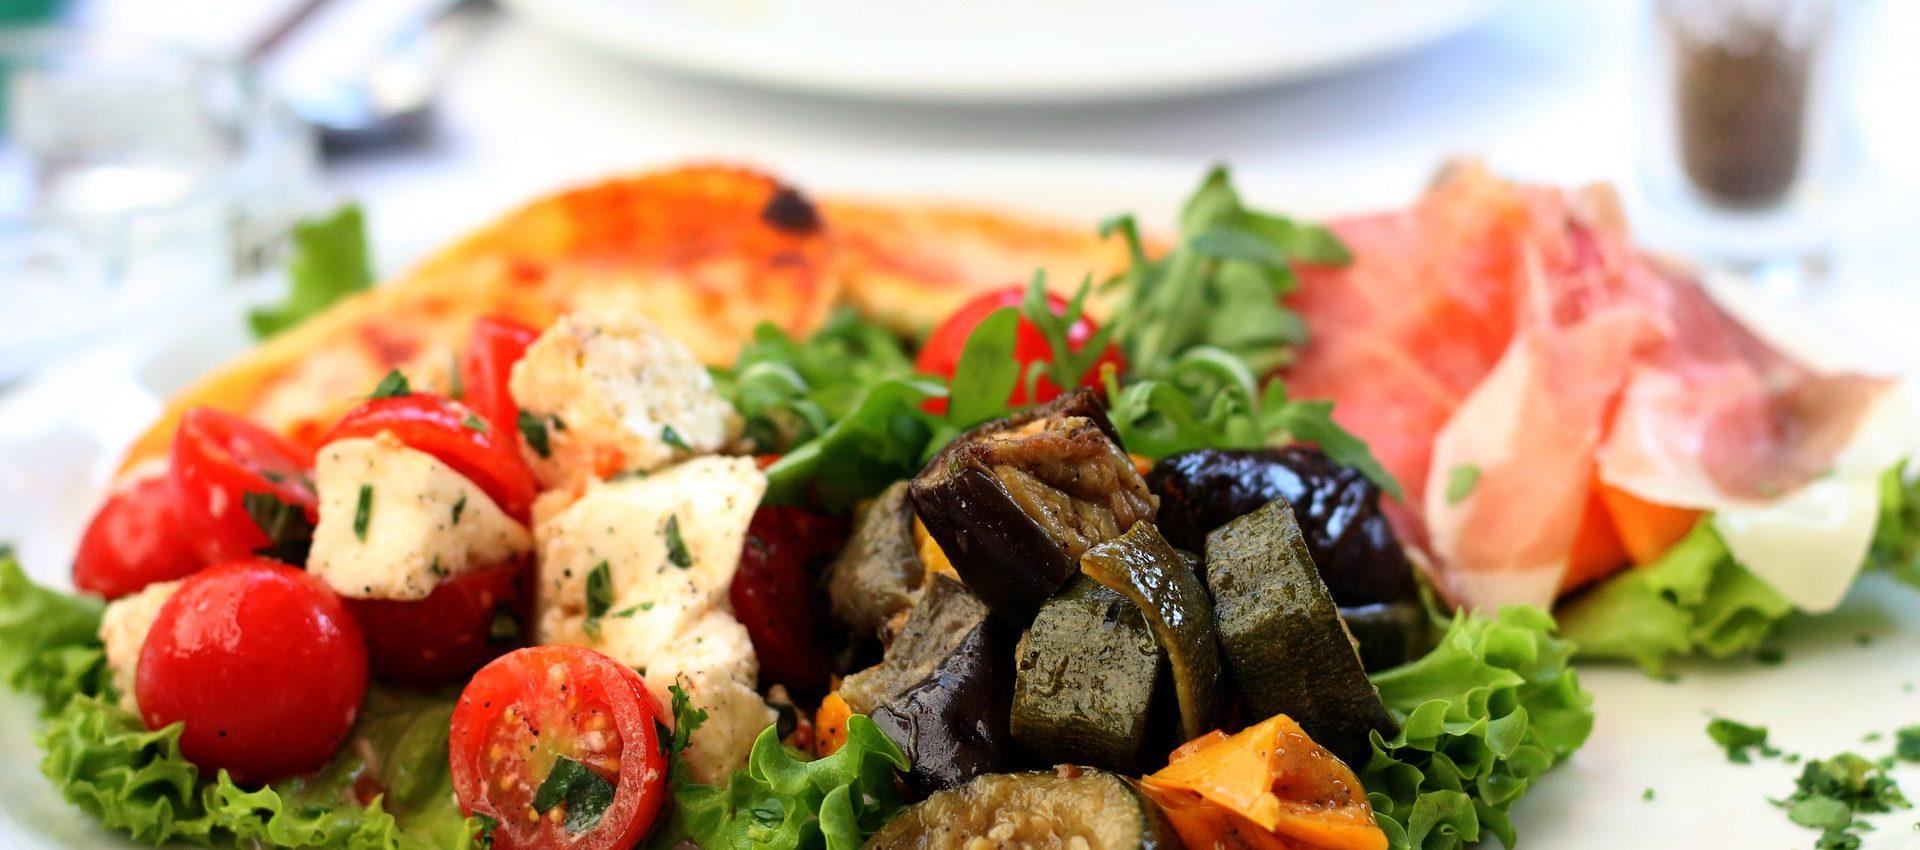 Salade aubergine miel chèvre au cookeo